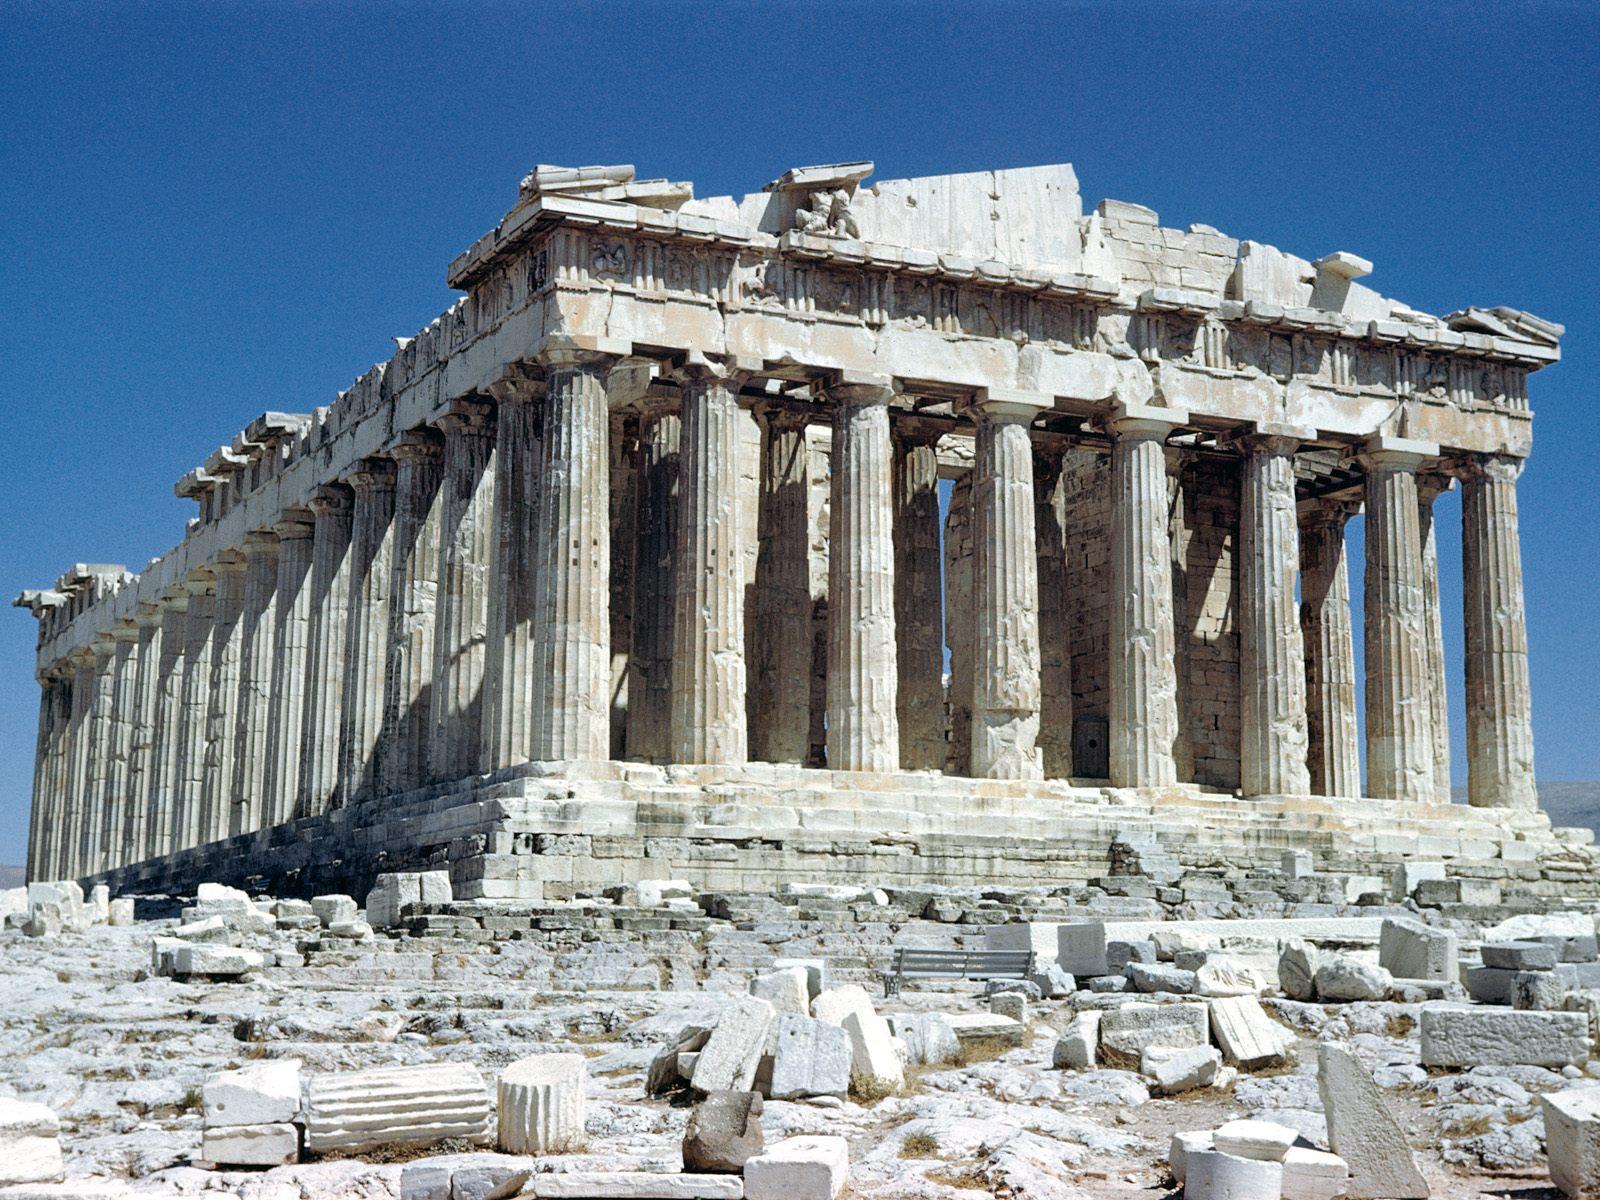 http://1.bp.blogspot.com/-jbsa4nF632M/Tg3dwN4tzqI/AAAAAAAAAKM/GcKOO1VNS0o/s1600/Acropolis.jpg